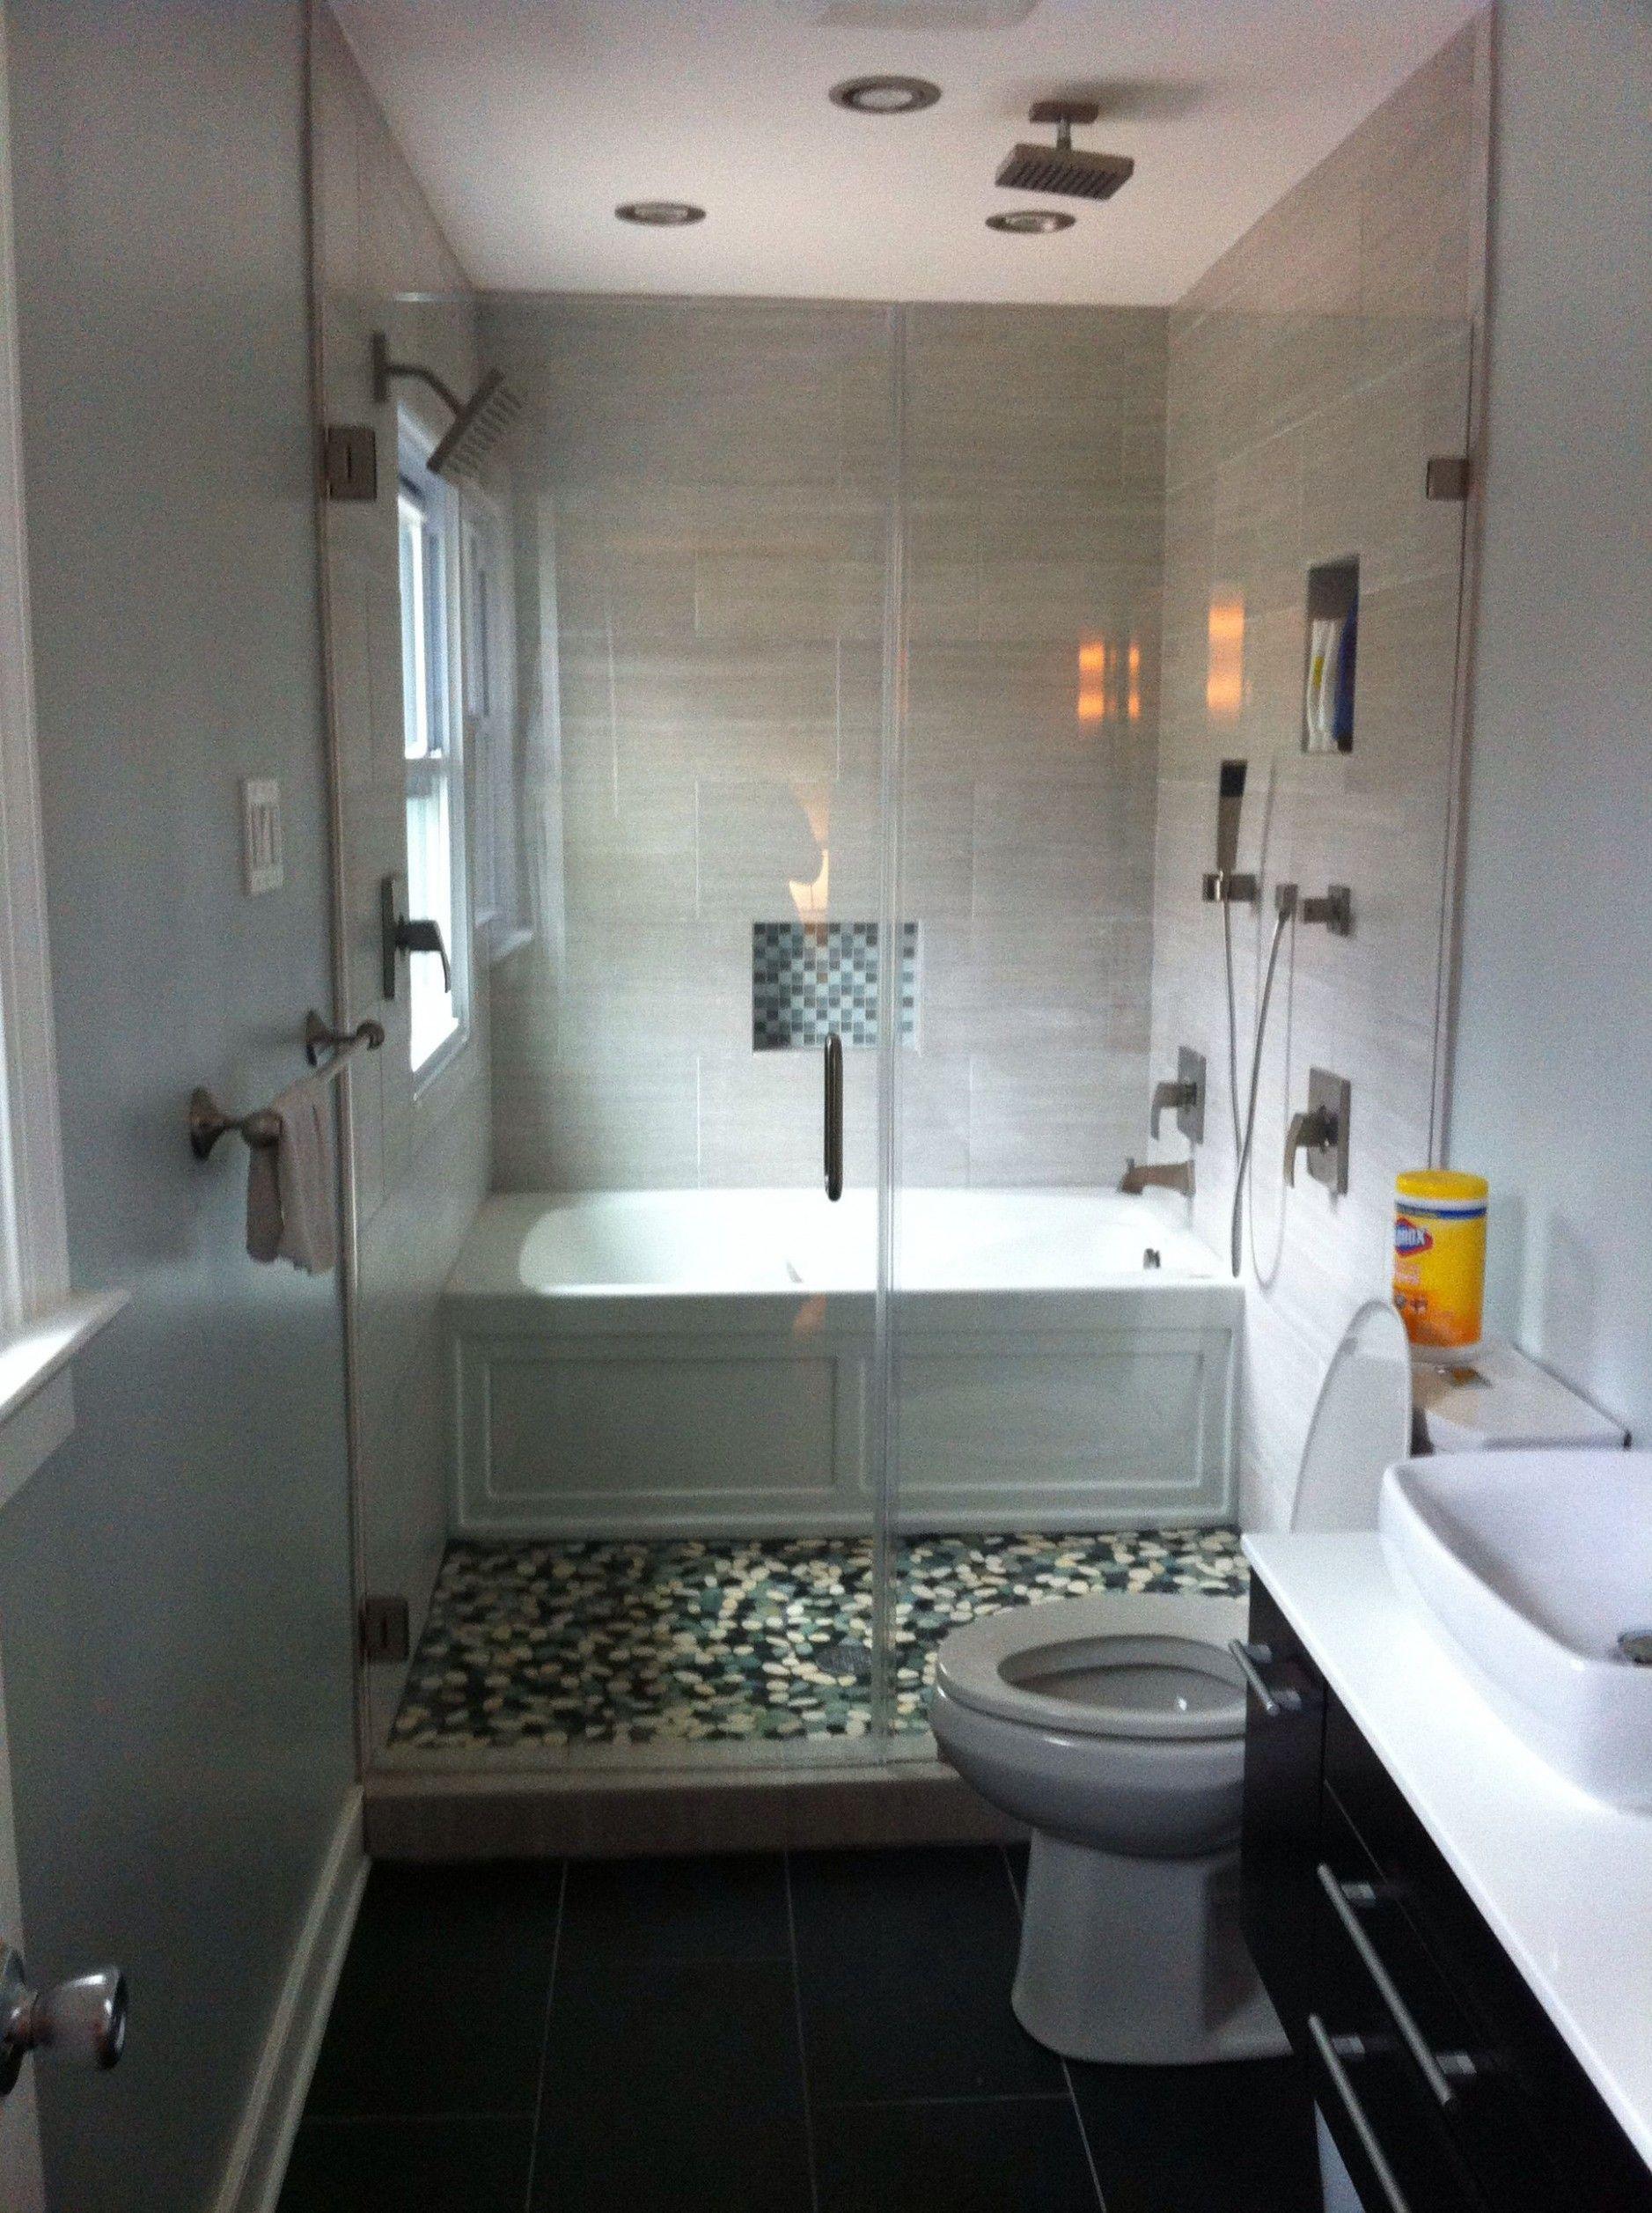 Small Narrow Bathroom Ideas With Tub Small Narrow Bathroom Small Bathroom Layout Bathtubs For Small Bathrooms